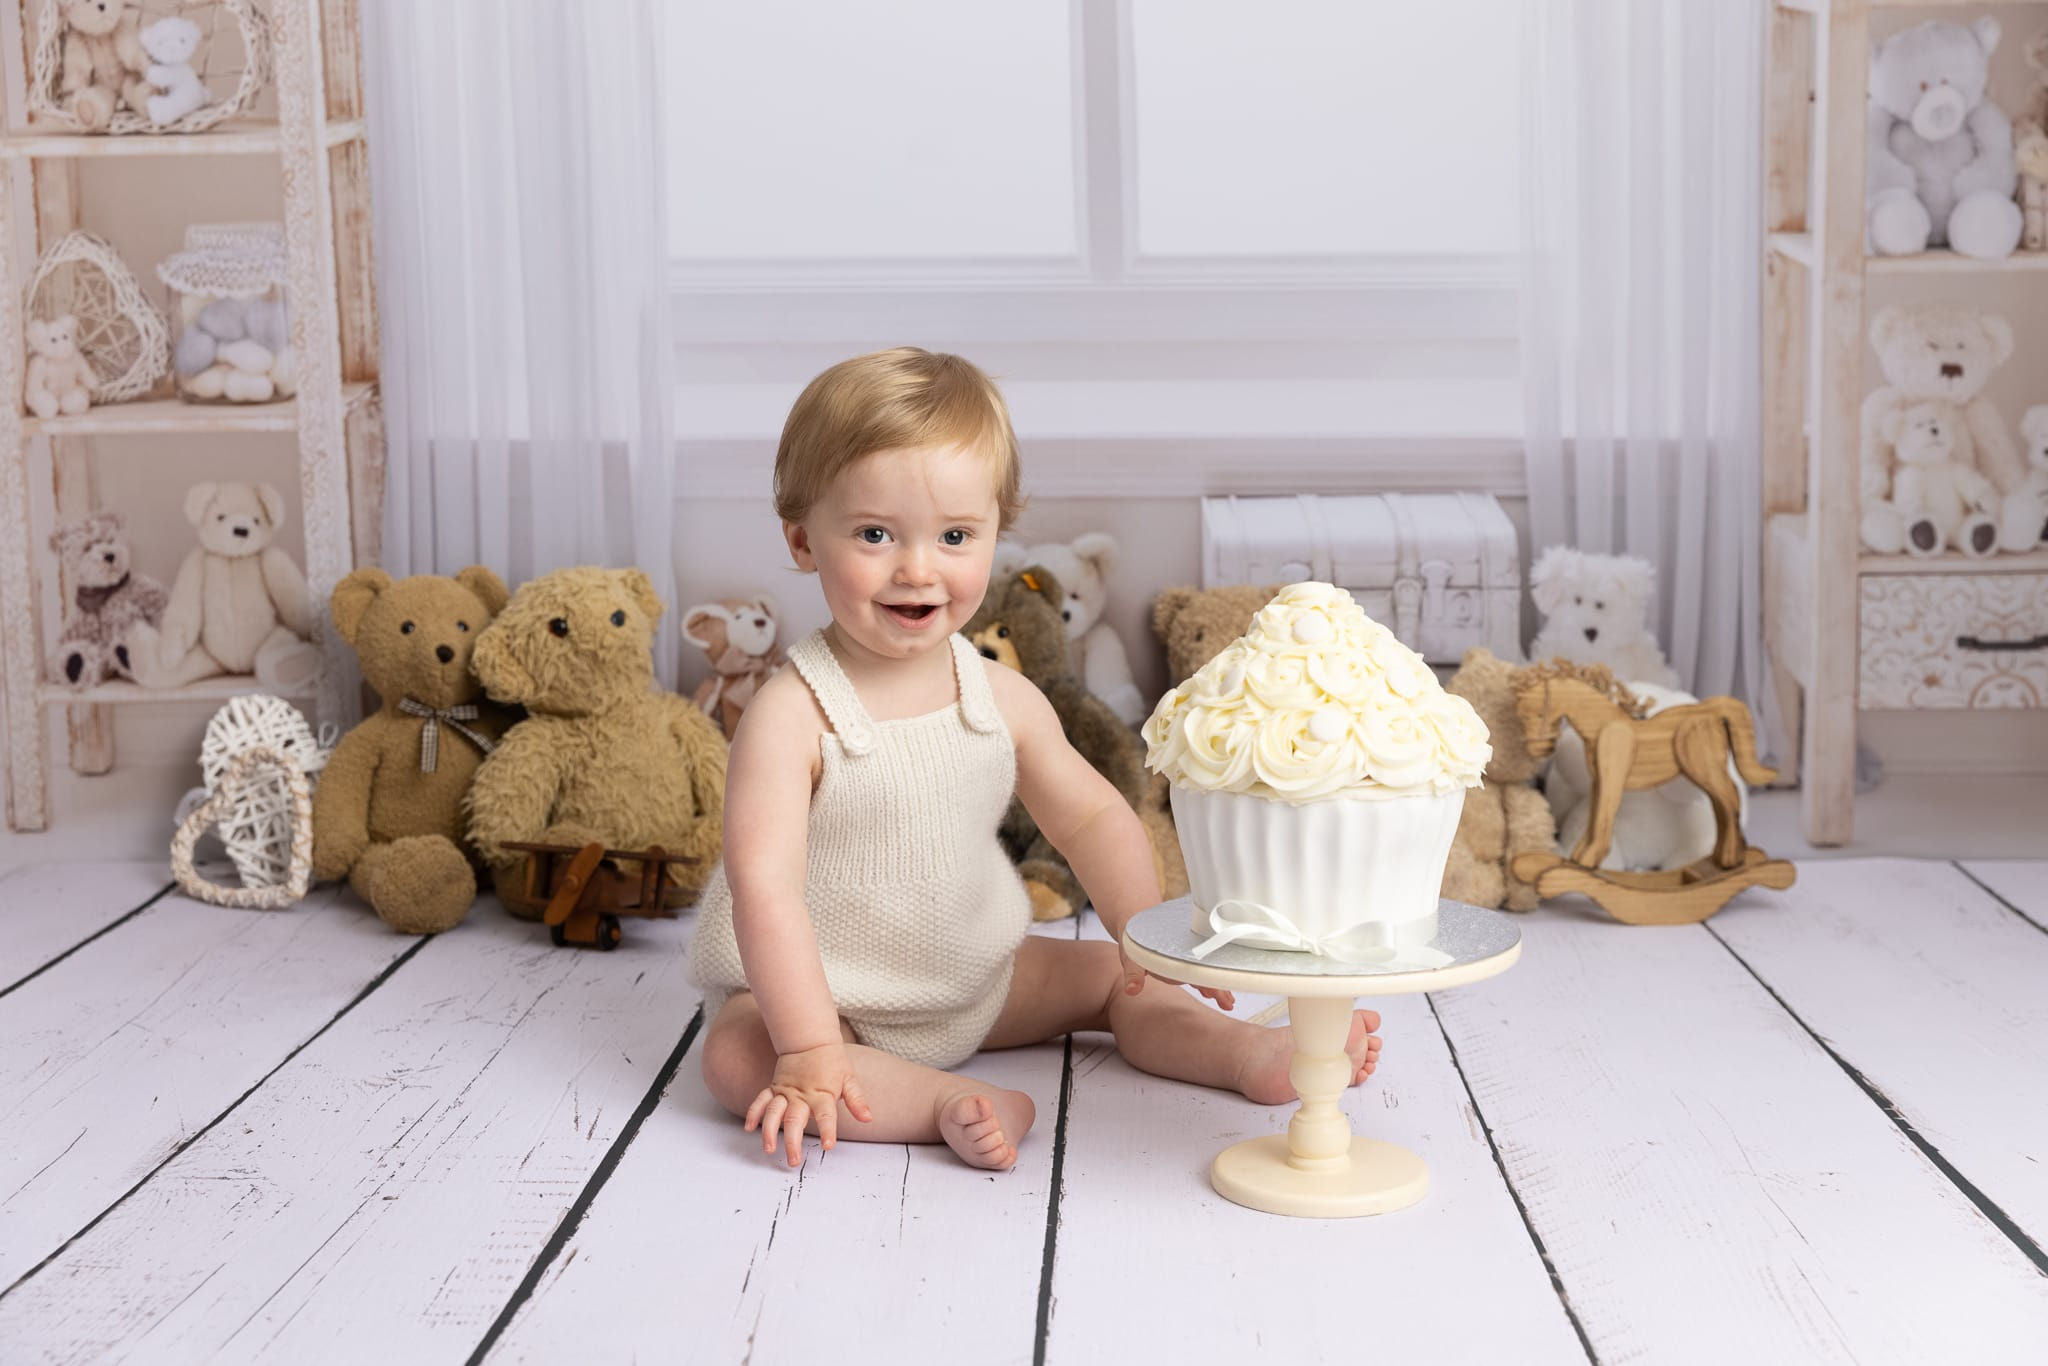 Baby cake smash photo